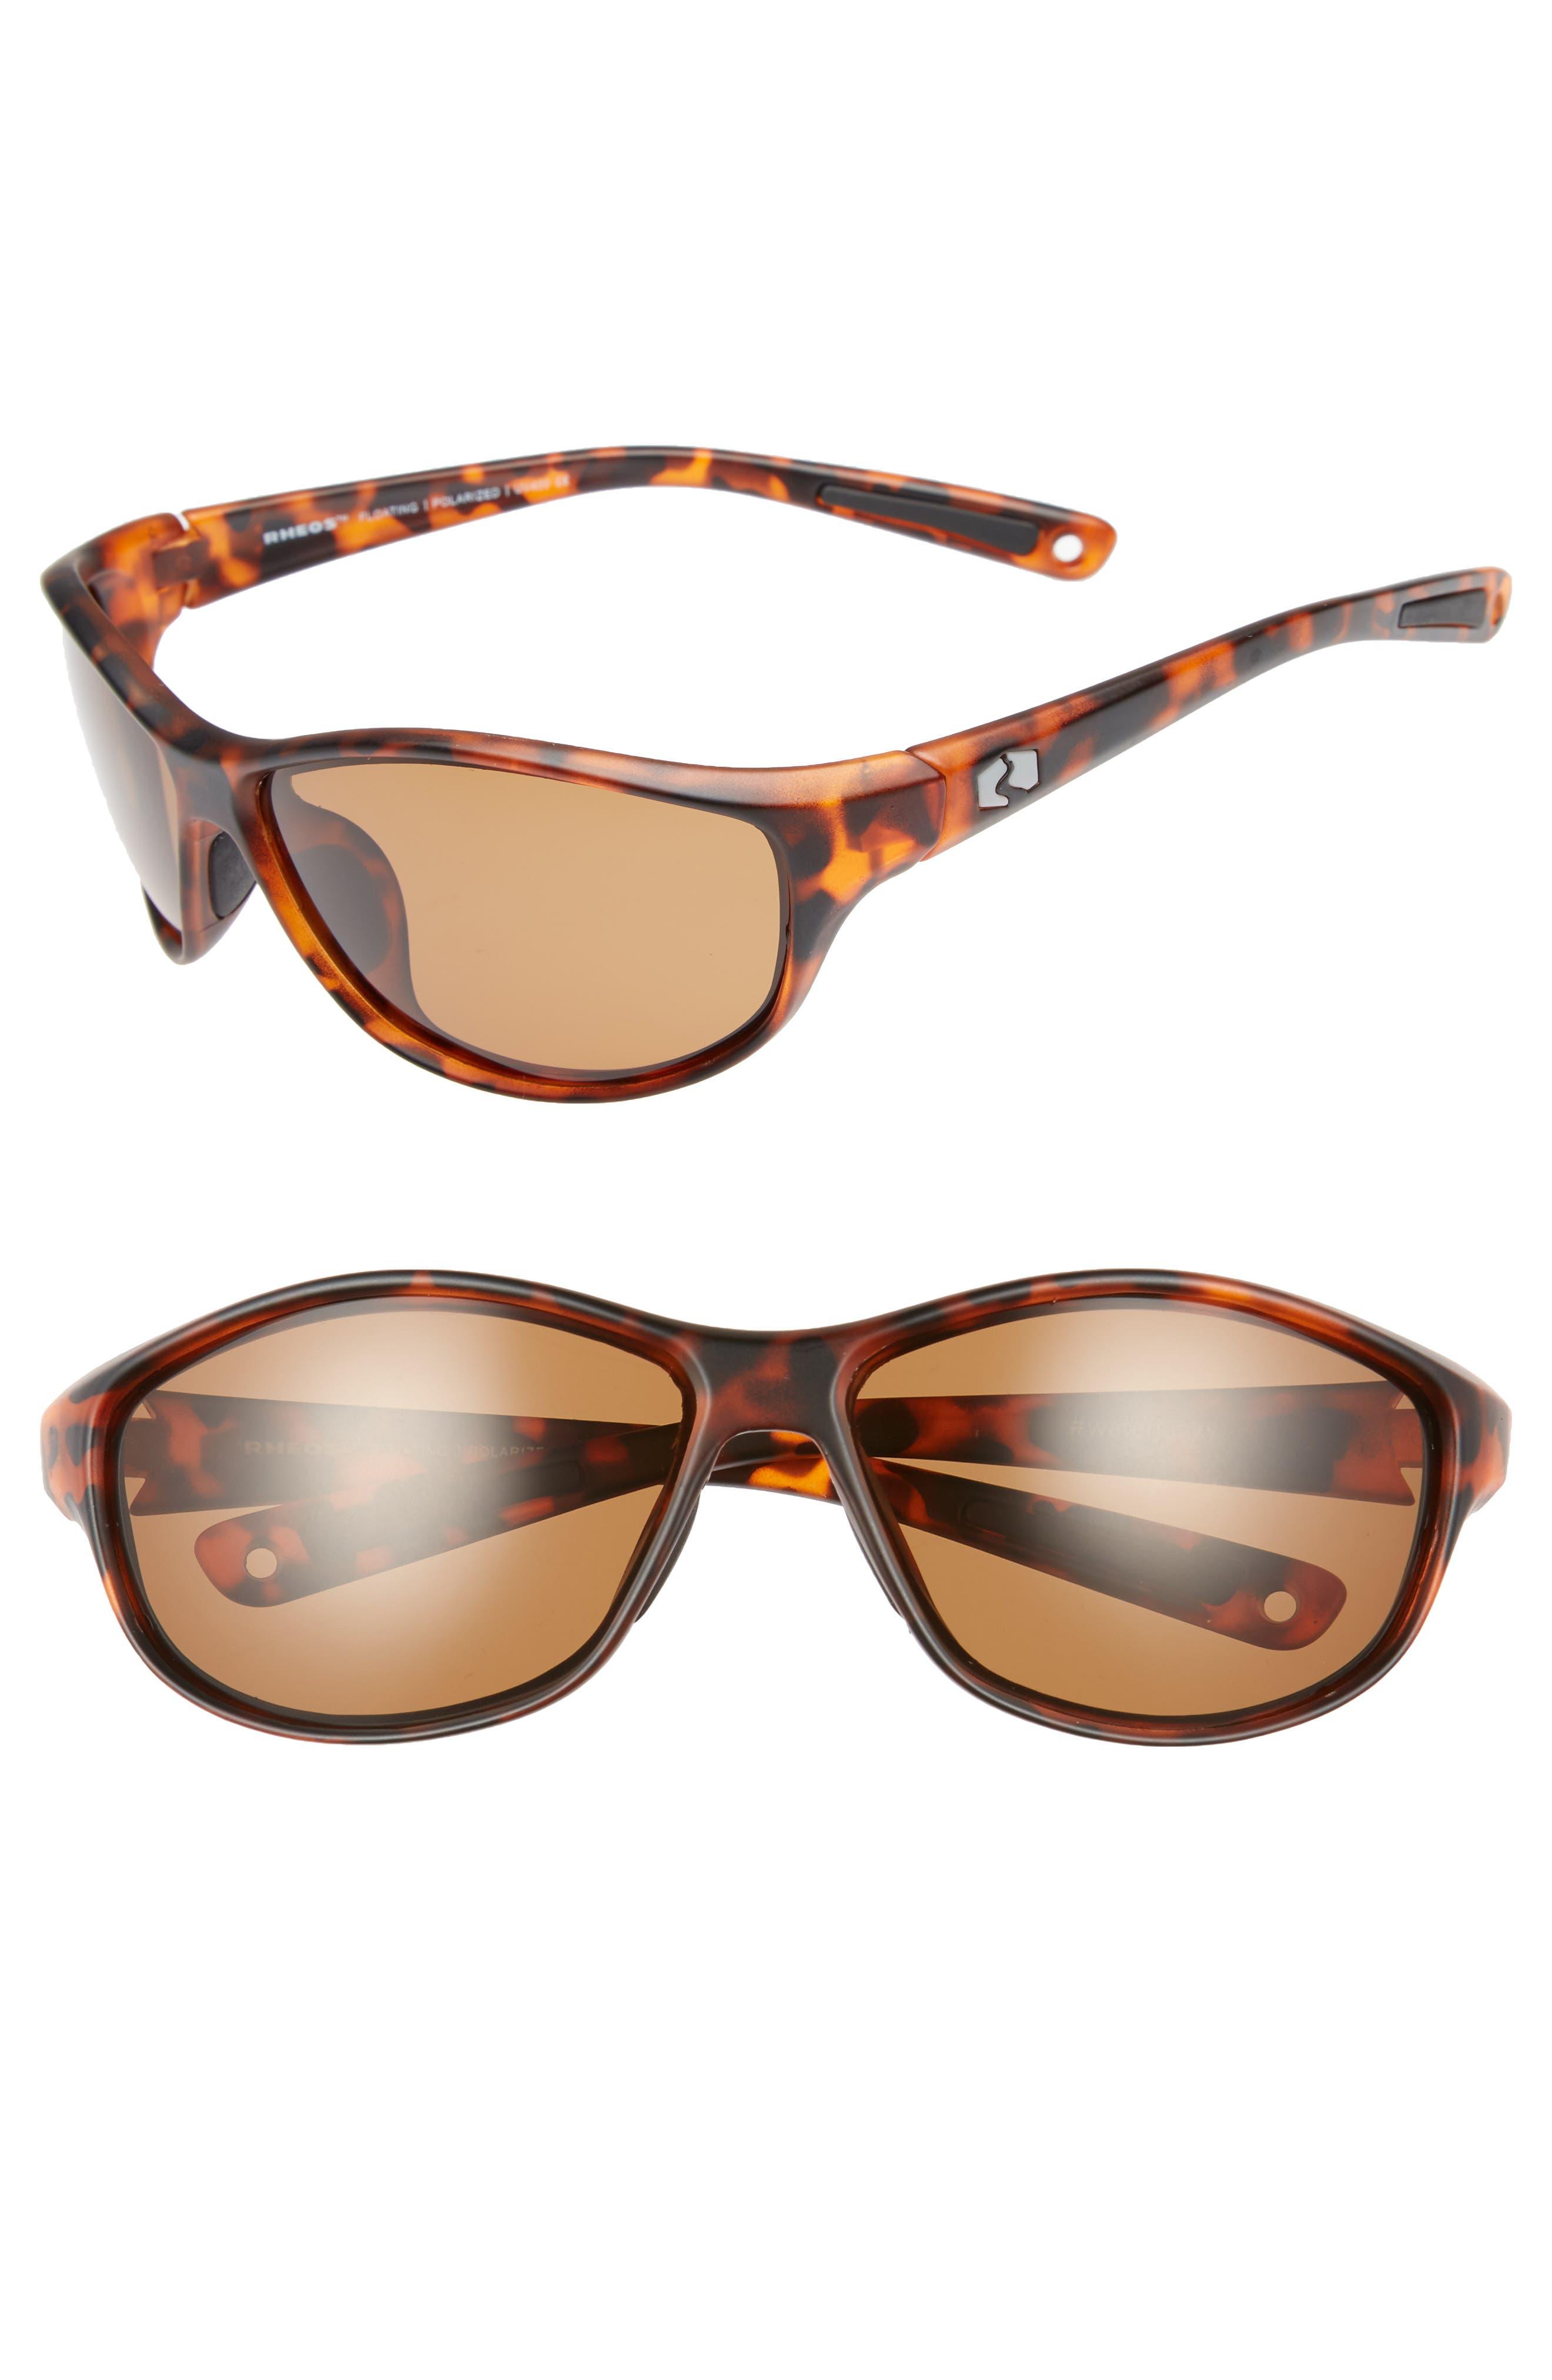 Bahias Floating 60mm Polarized Sunglasses,                             Main thumbnail 1, color,                             Tortoise / Amber